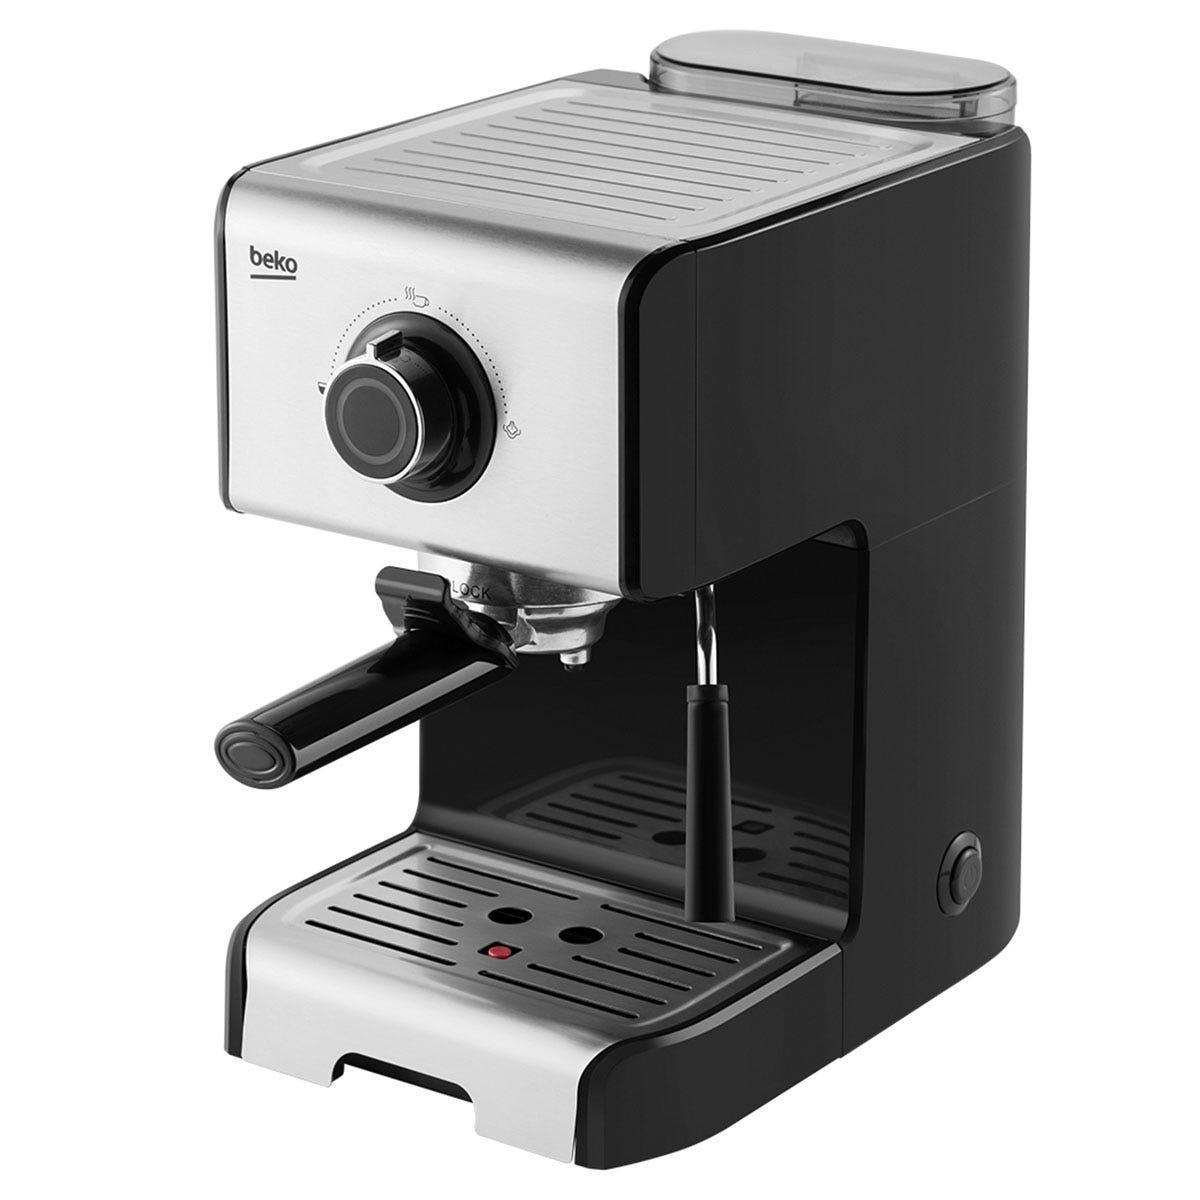 Image of Beko Espresso Coffee Machine - Black